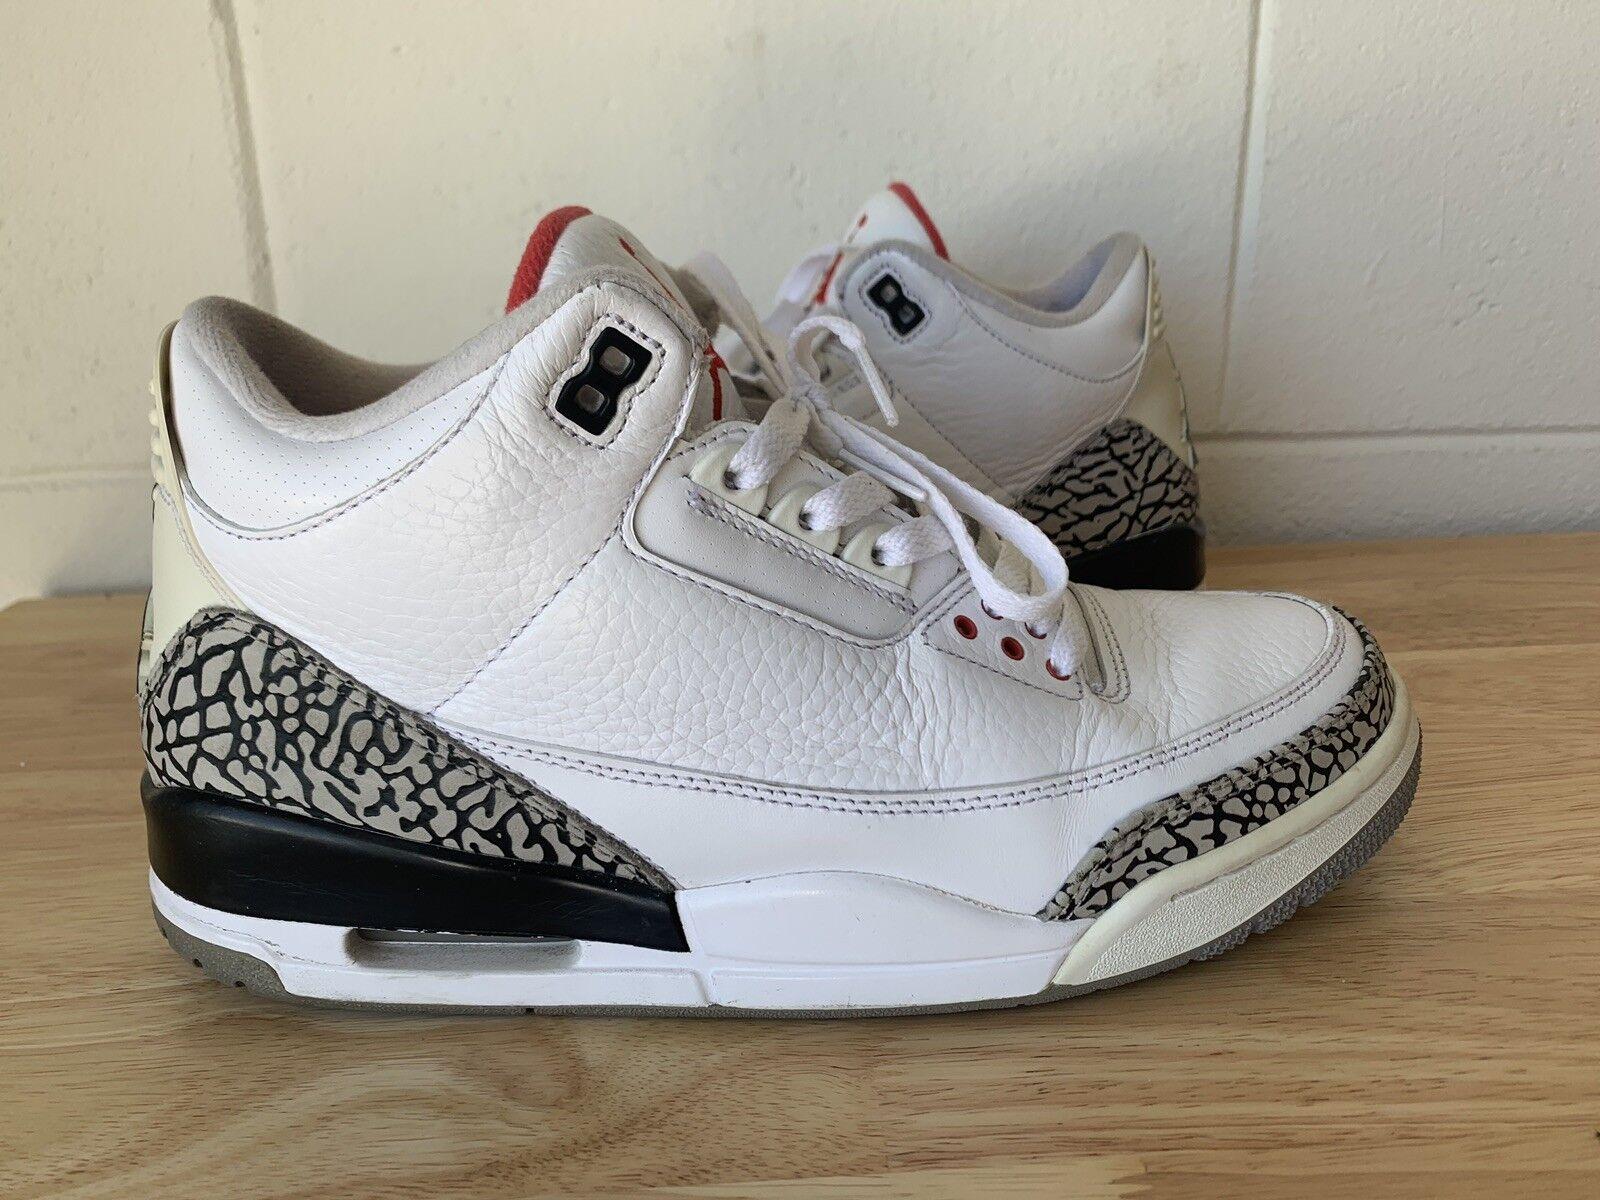 Air Jordan 3 Retro White Cement III 136064-105 Size 9 Used AJ3 Nike Authentic